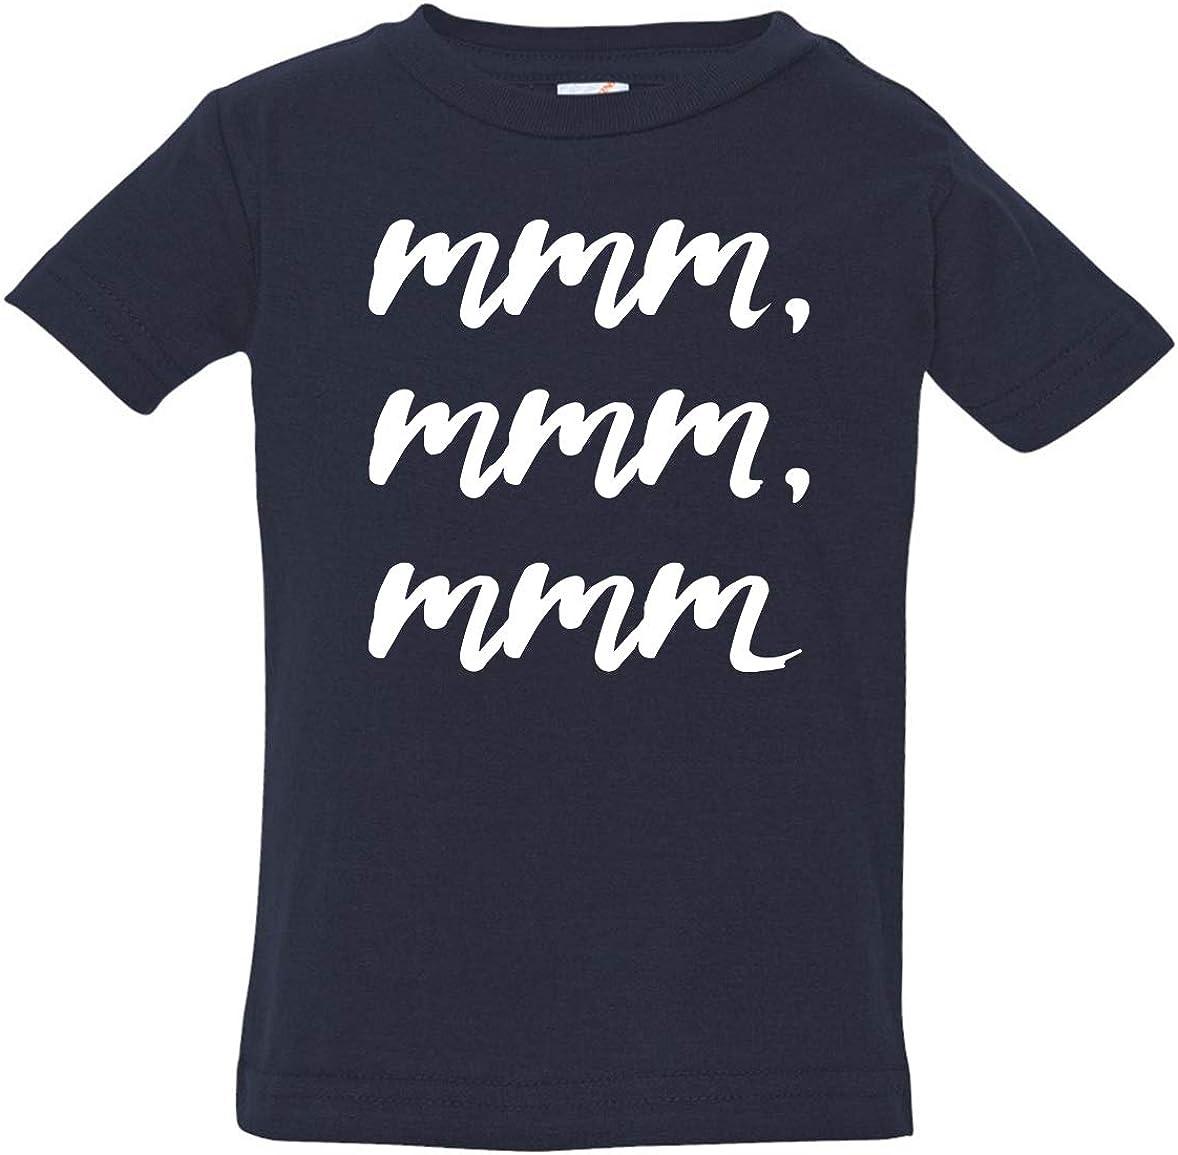 mmm Tenacitee Babys Mmm mmm Shirt